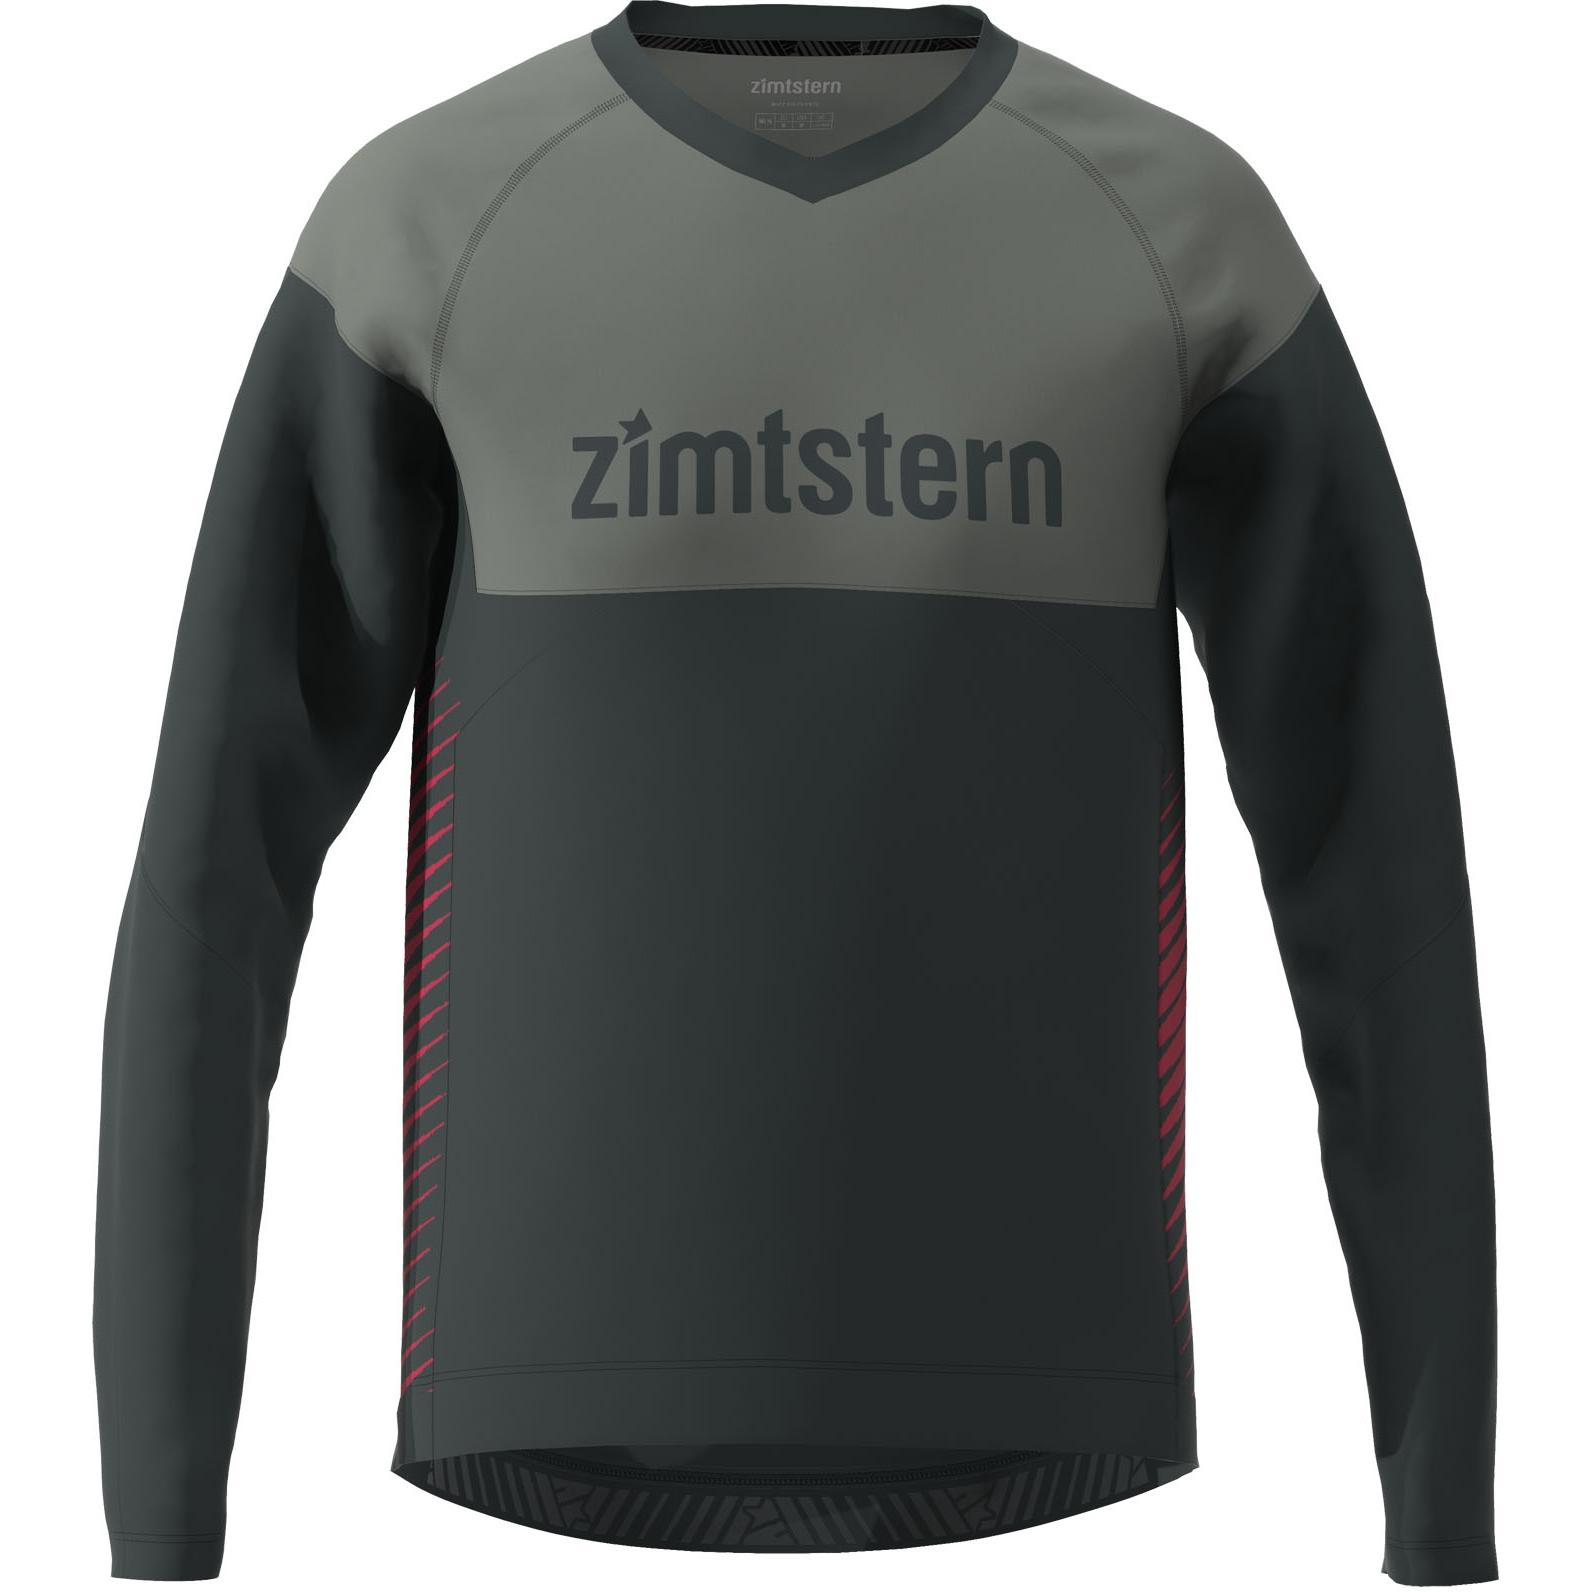 Zimtstern Bulletz Langarm-Shirt - pirate black/gun metal/jester red